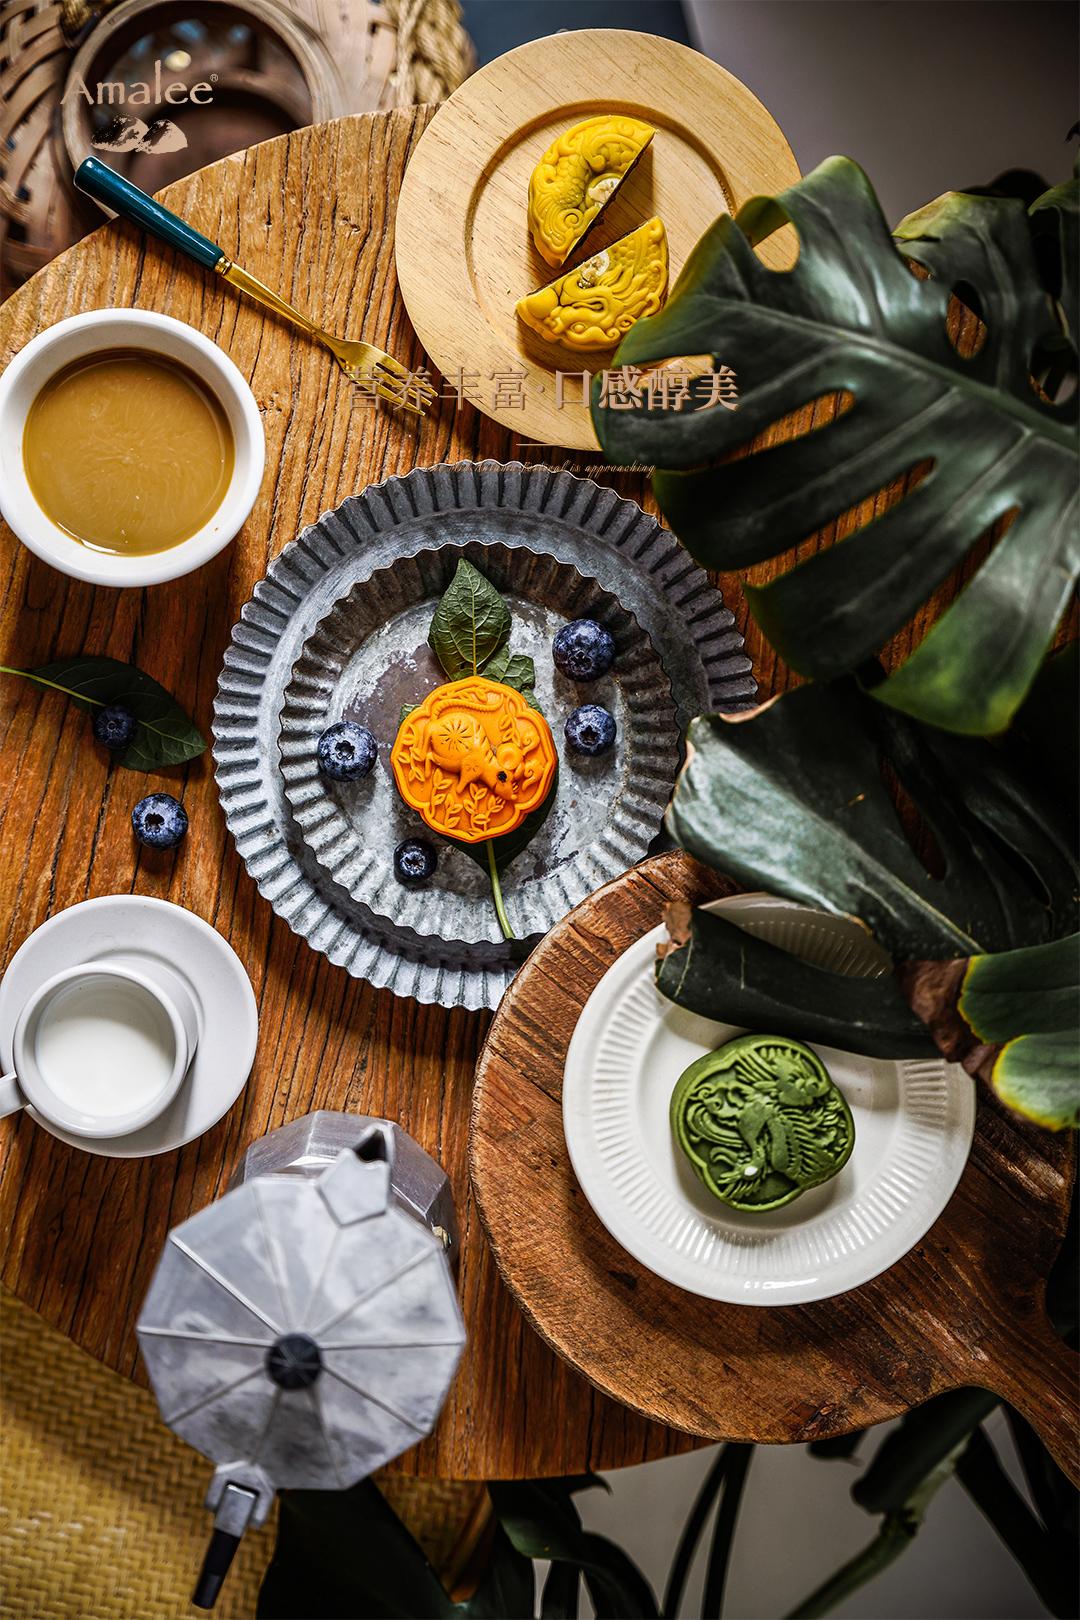 Amalee Birdnest mooncake orange color